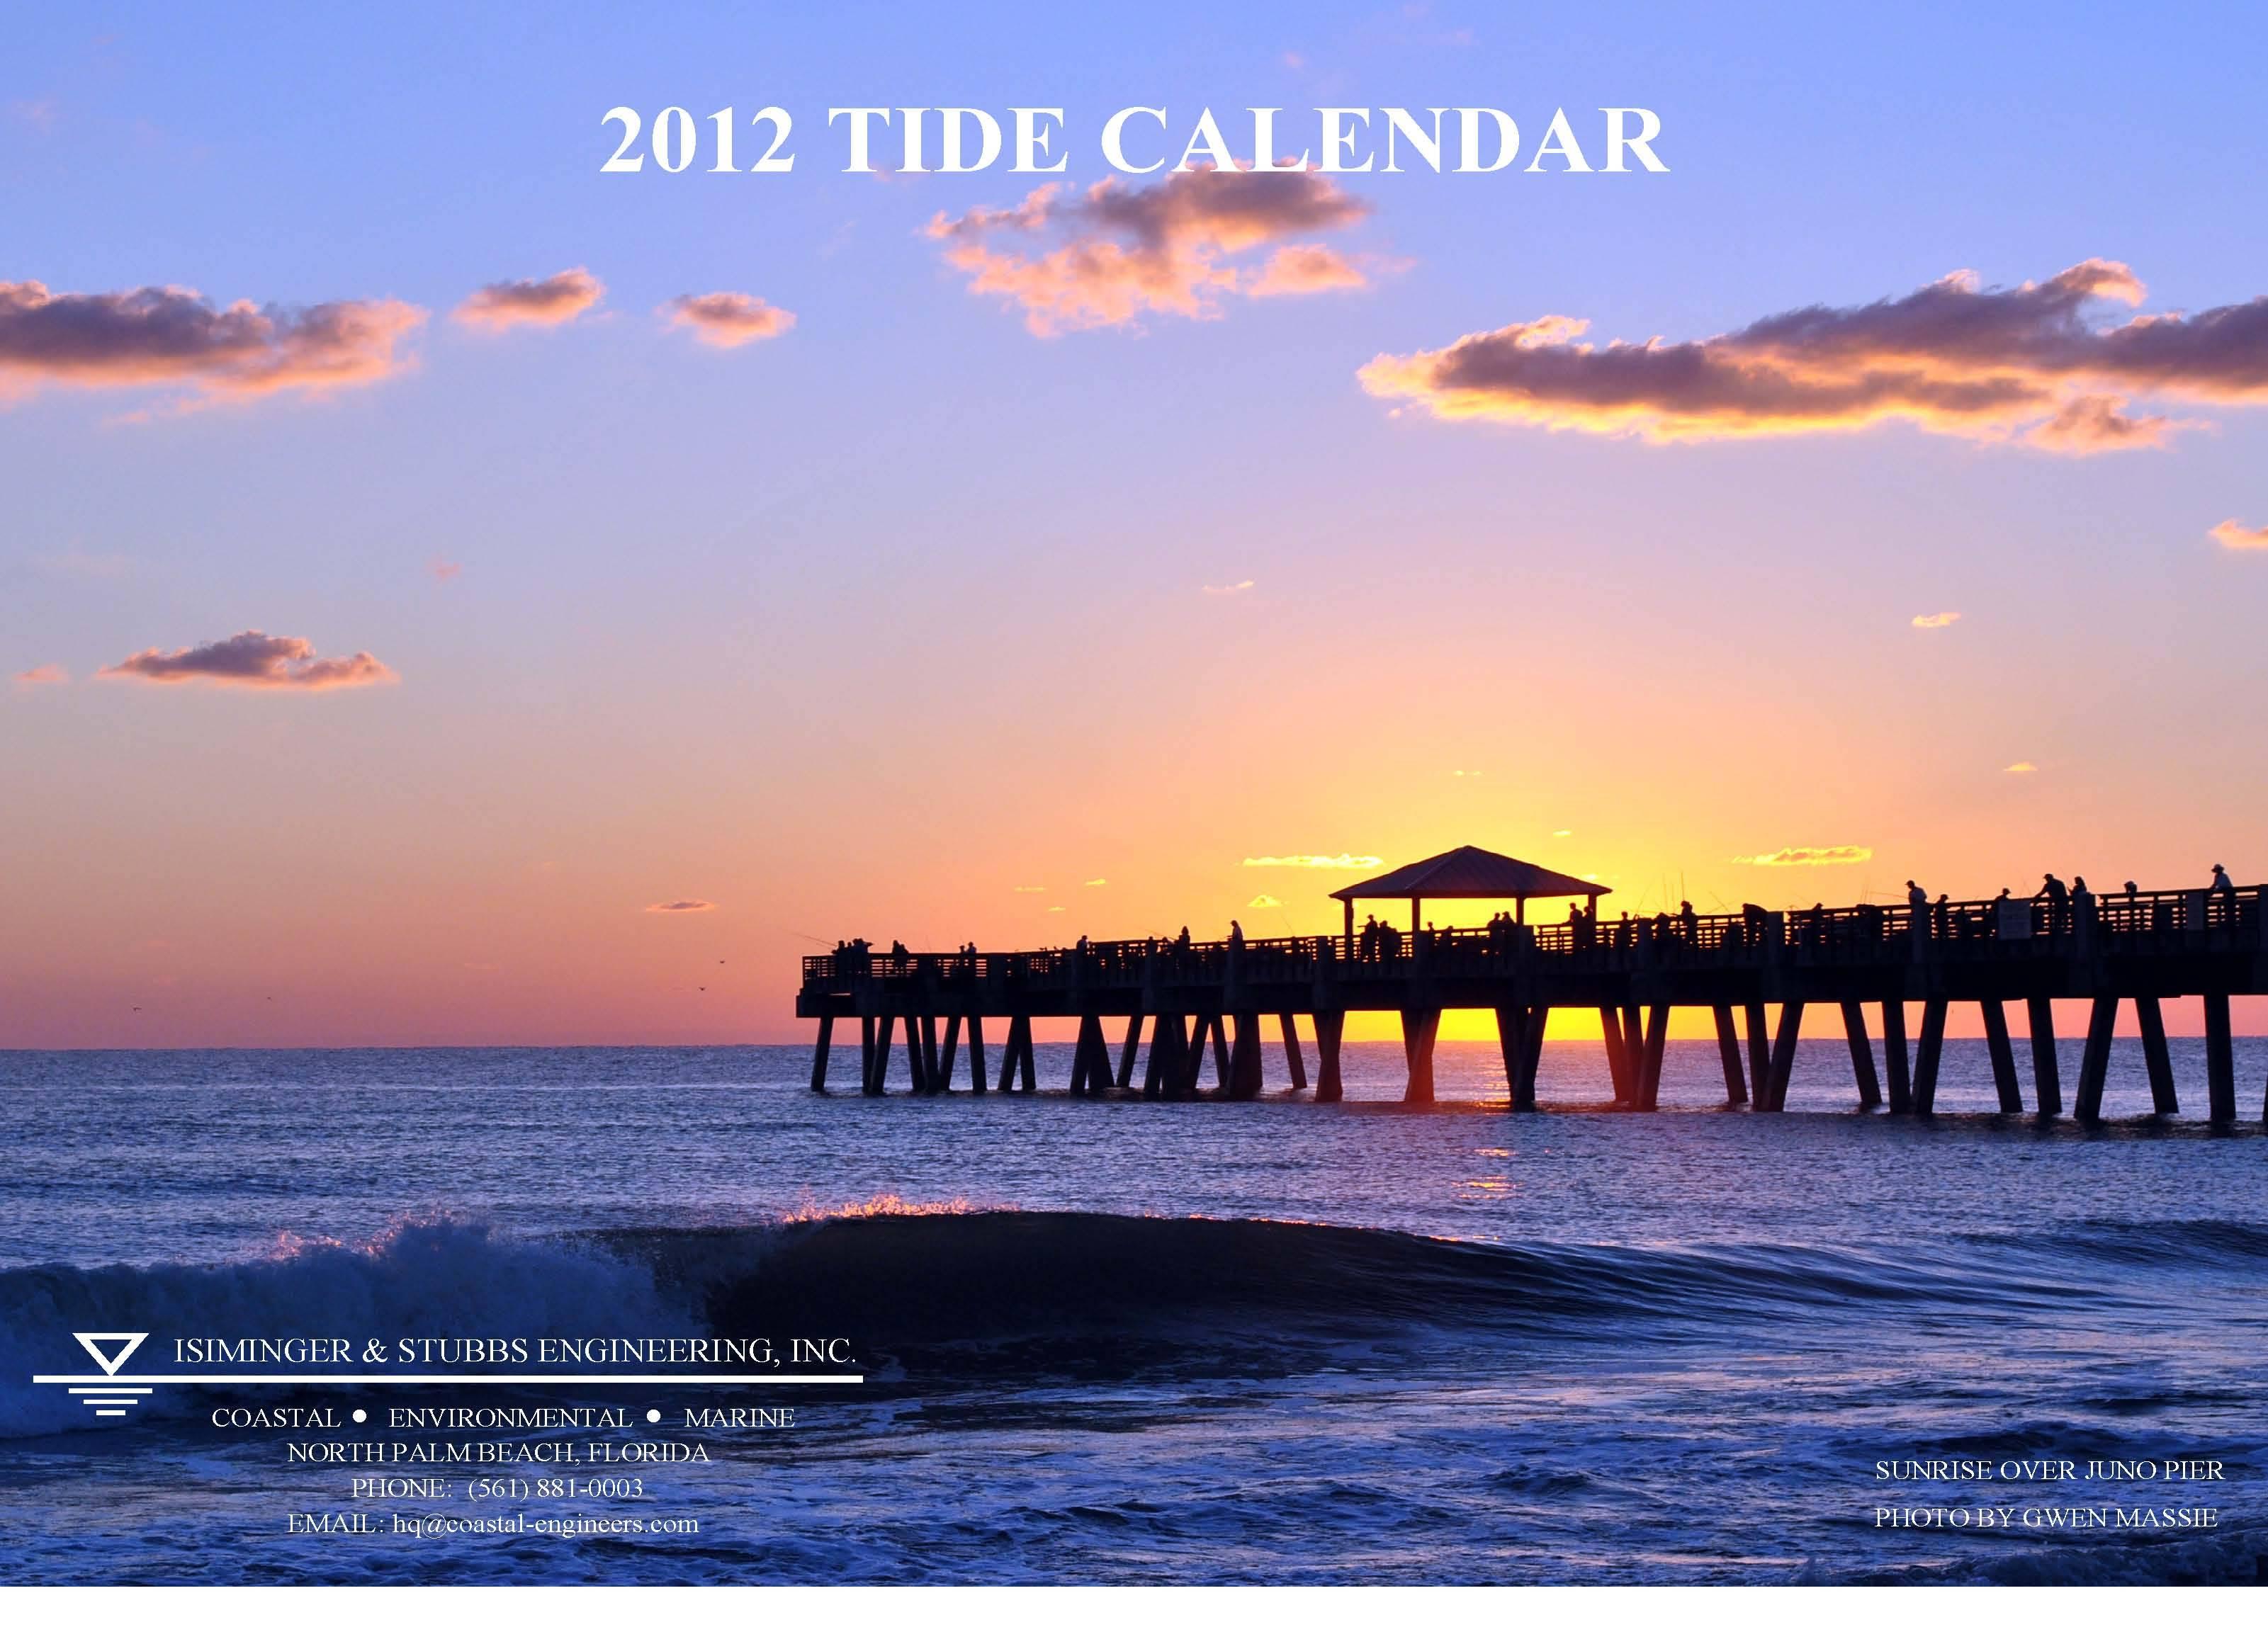 2012 Tide Calendar Cover